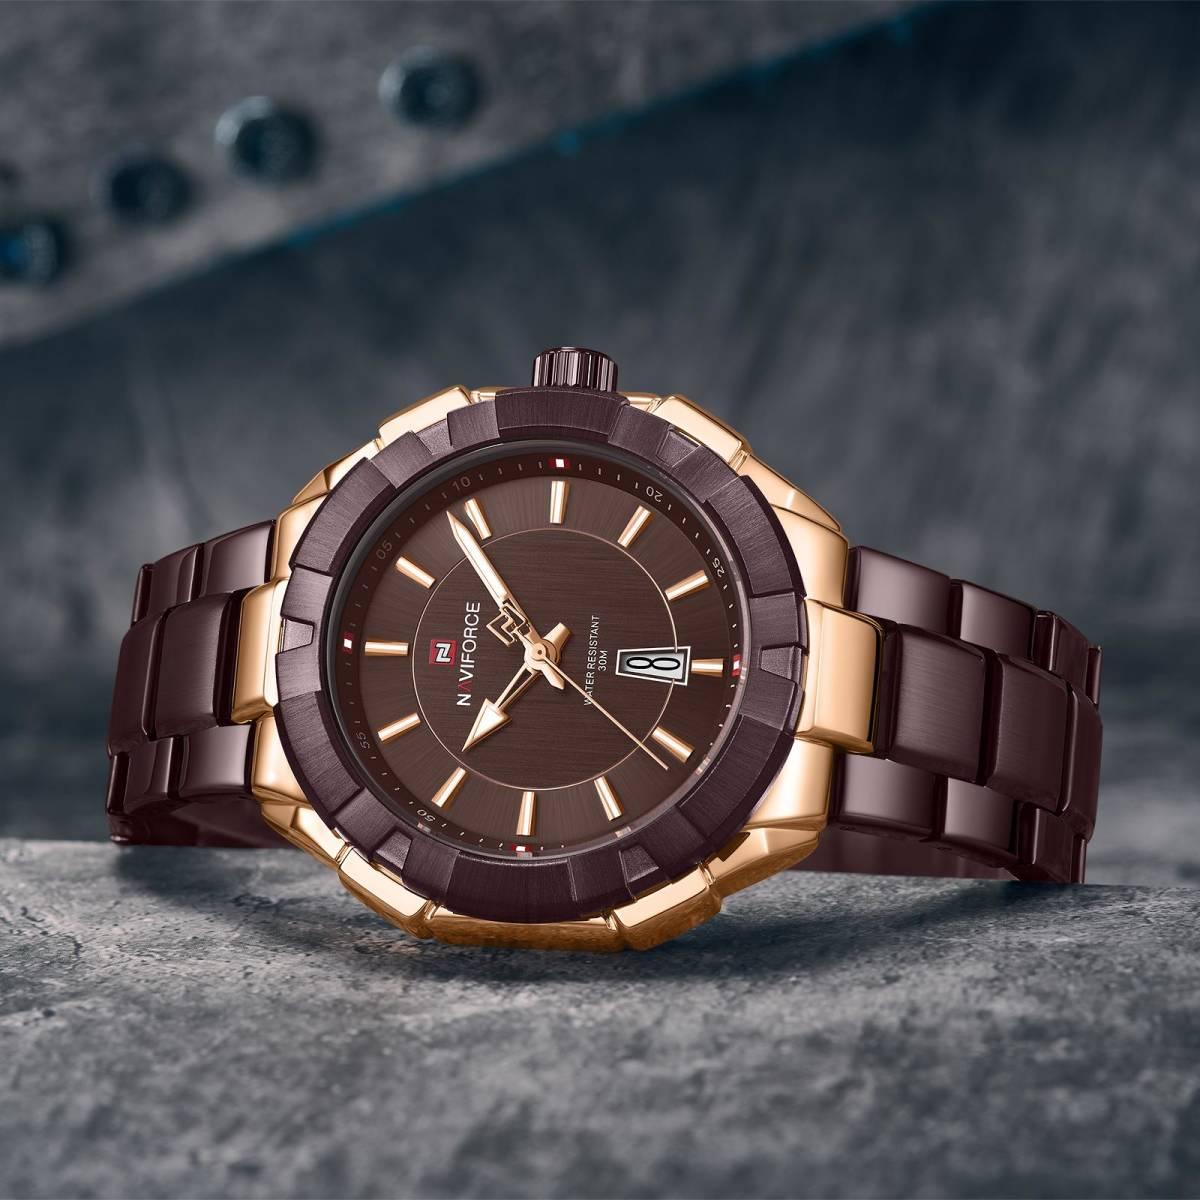 Naviforce ファッション男性高級ブランドのスポーツクォーツ腕時計男性ビッグダイヤル時計防水時計レロジオ masculino_画像2